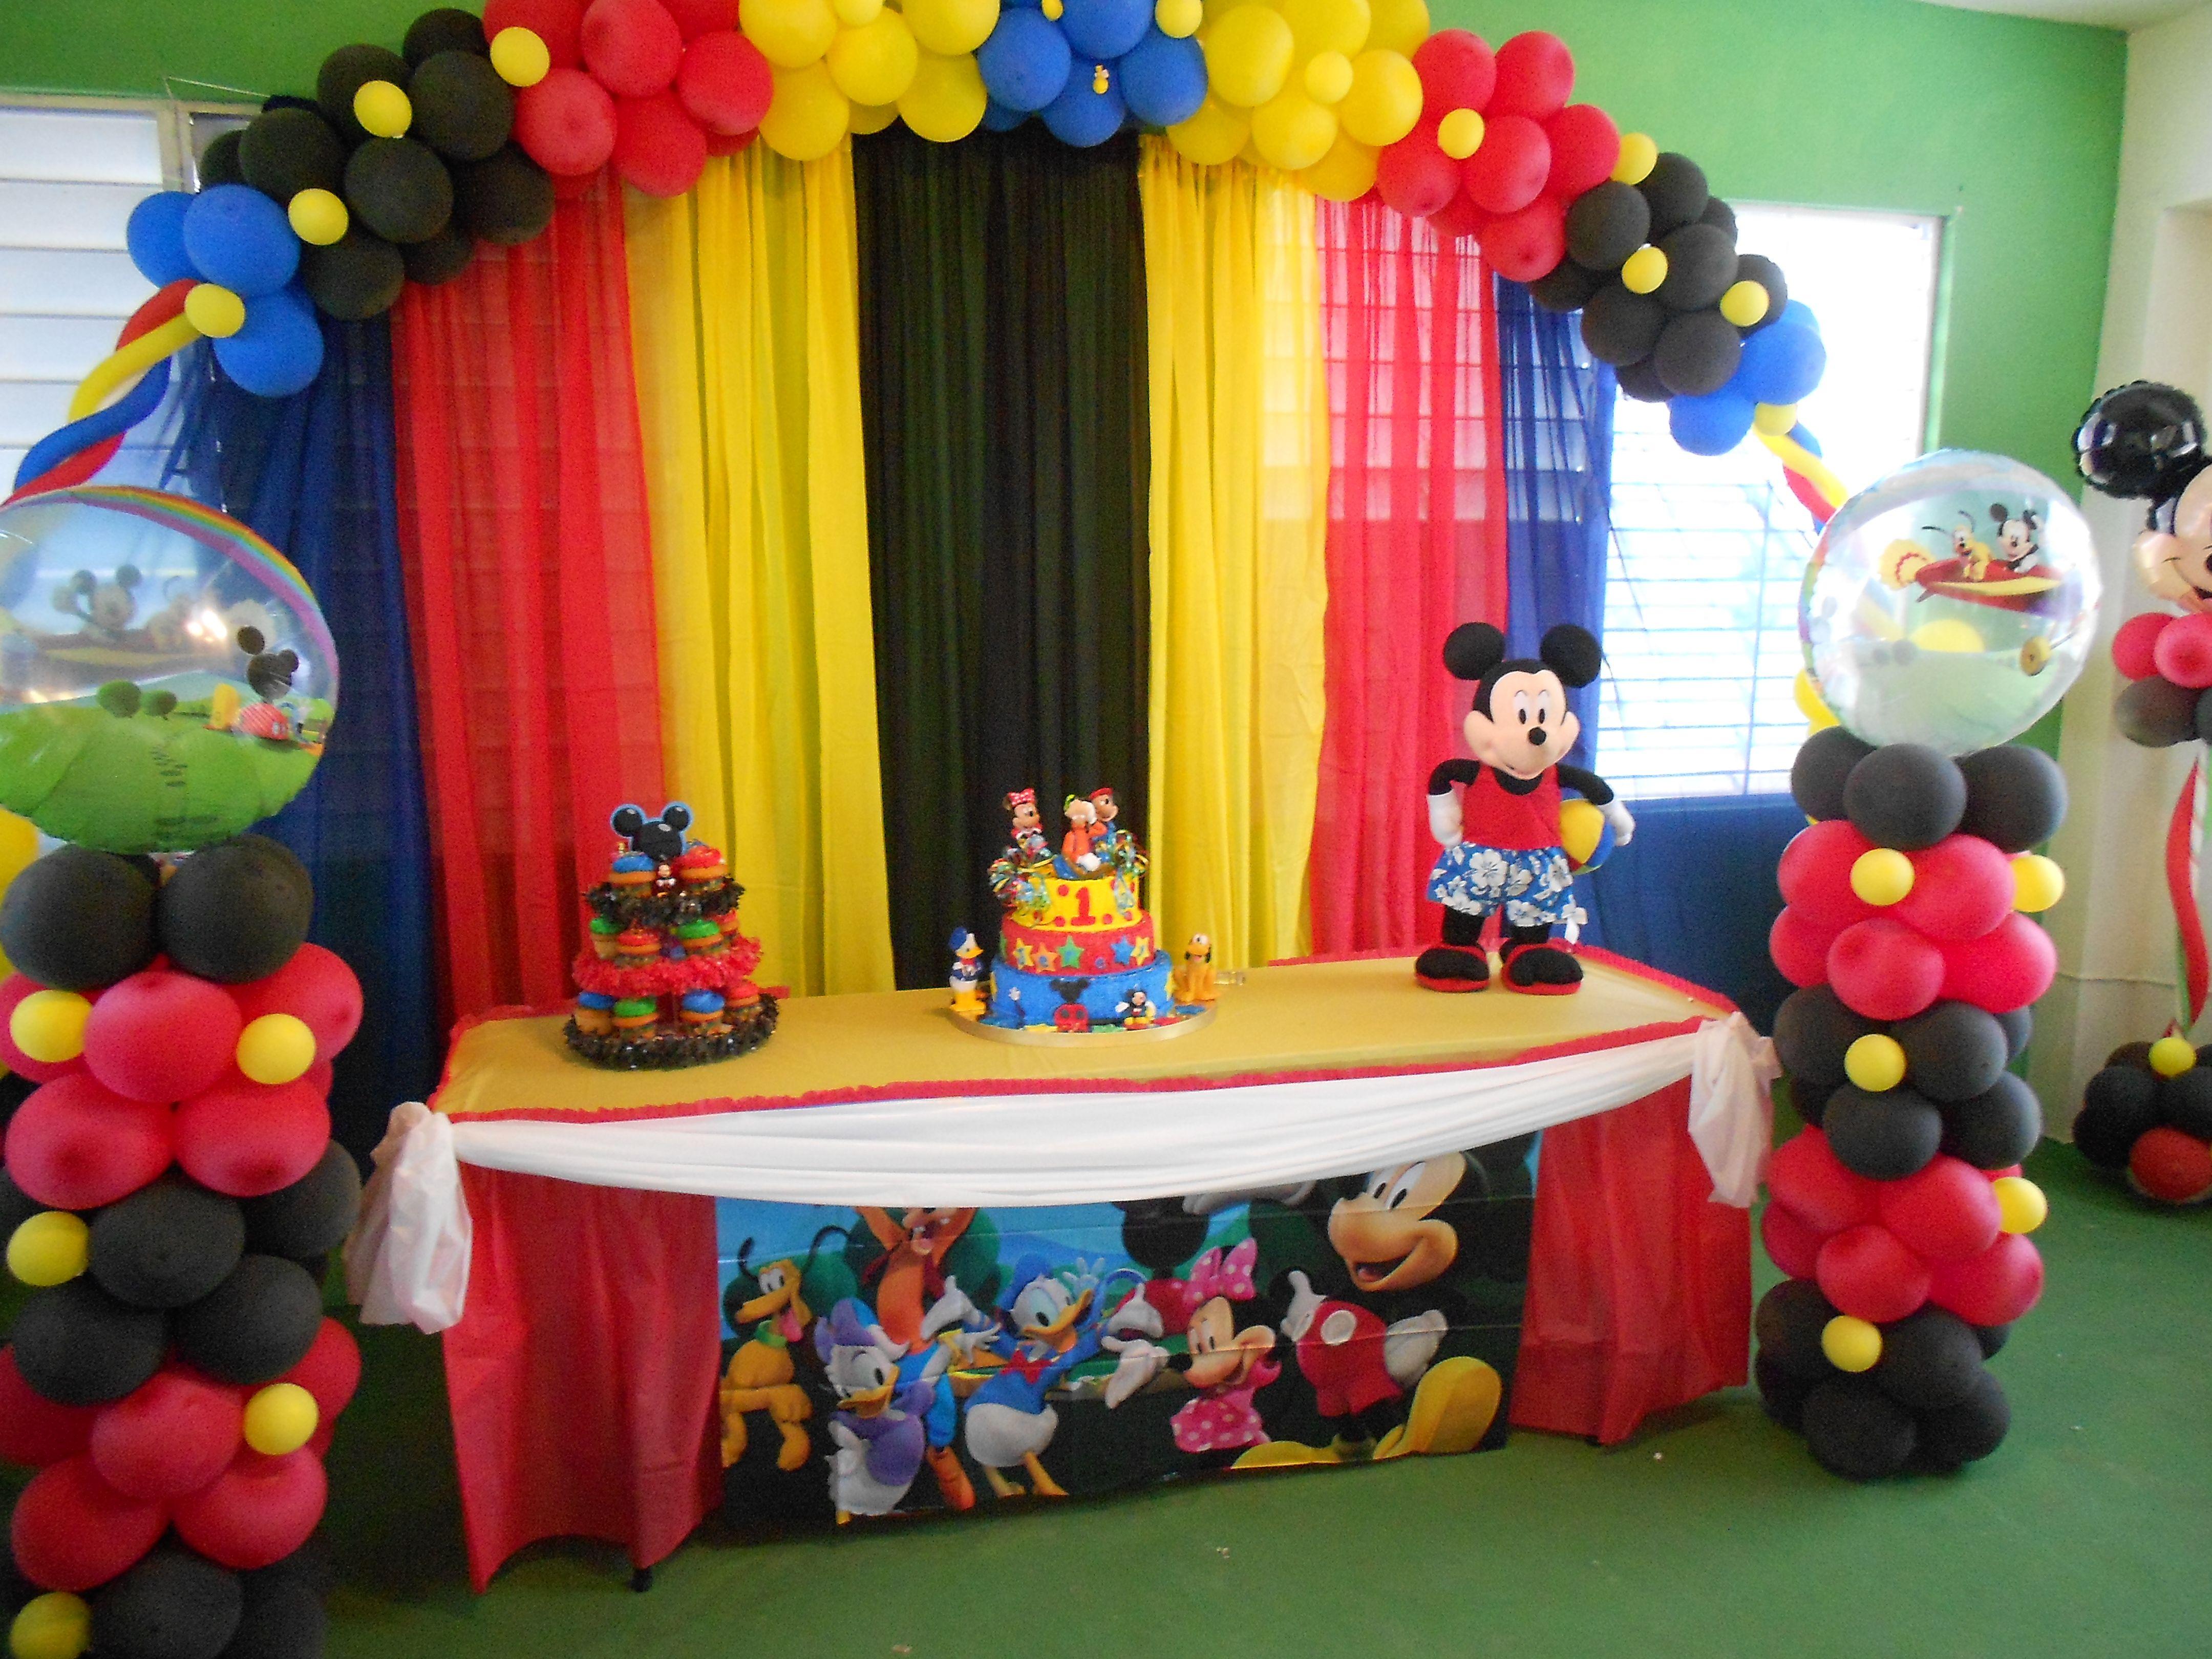 Mesa prinsipal fiestaideas ydalia pinterest - Decorar mesas para fiestas ...